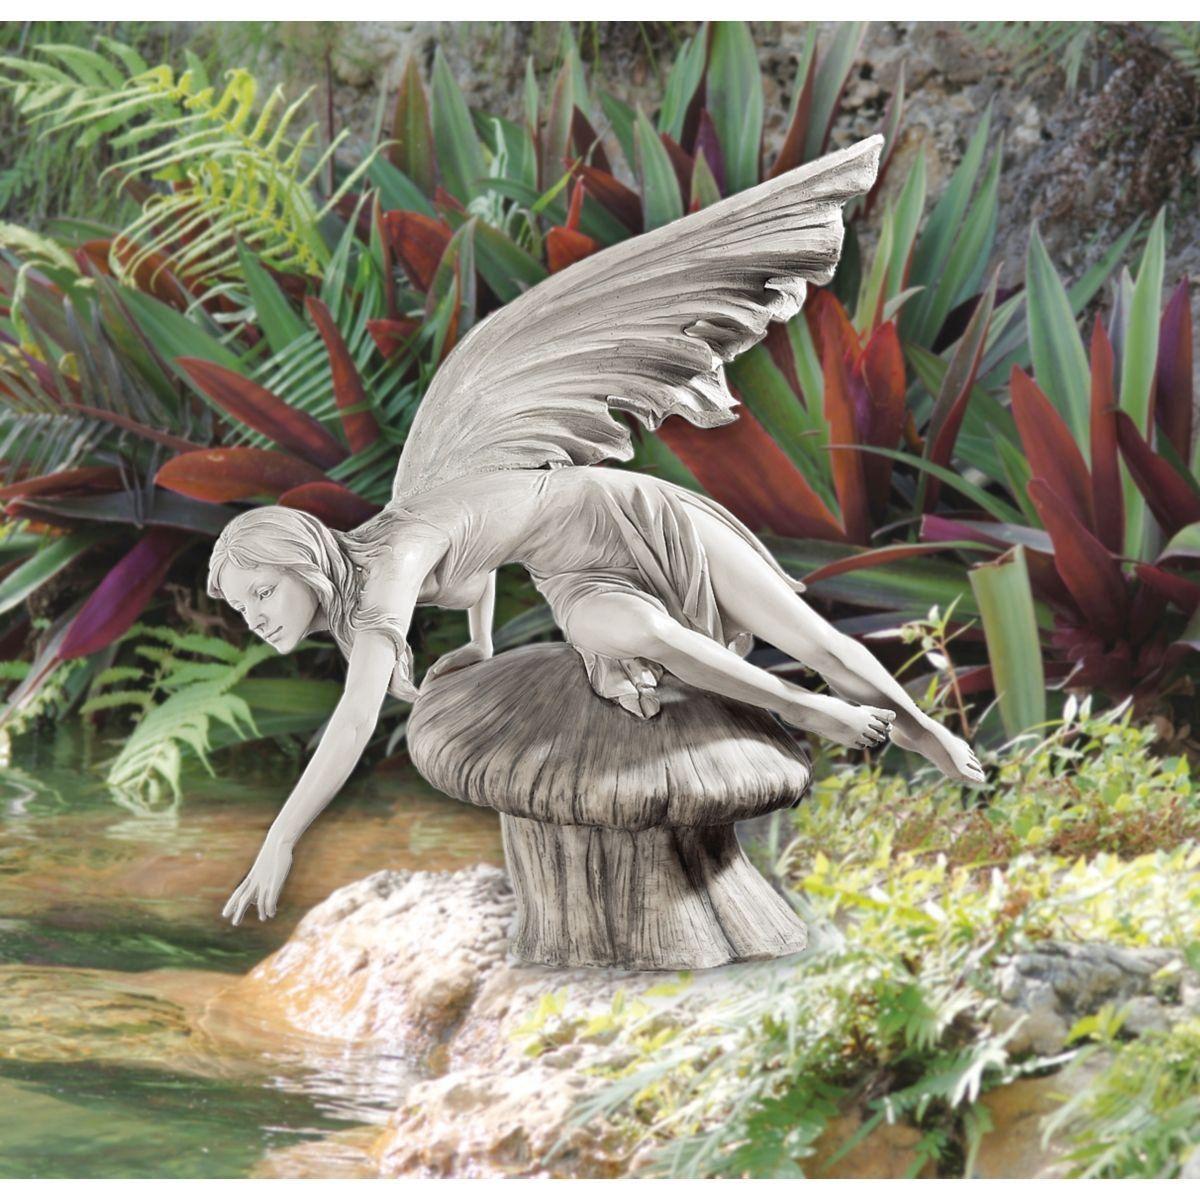 Elegant Amazon.com : The Daydream Fairy Statue : Outdoor Statues : Patio, Lawn U0026